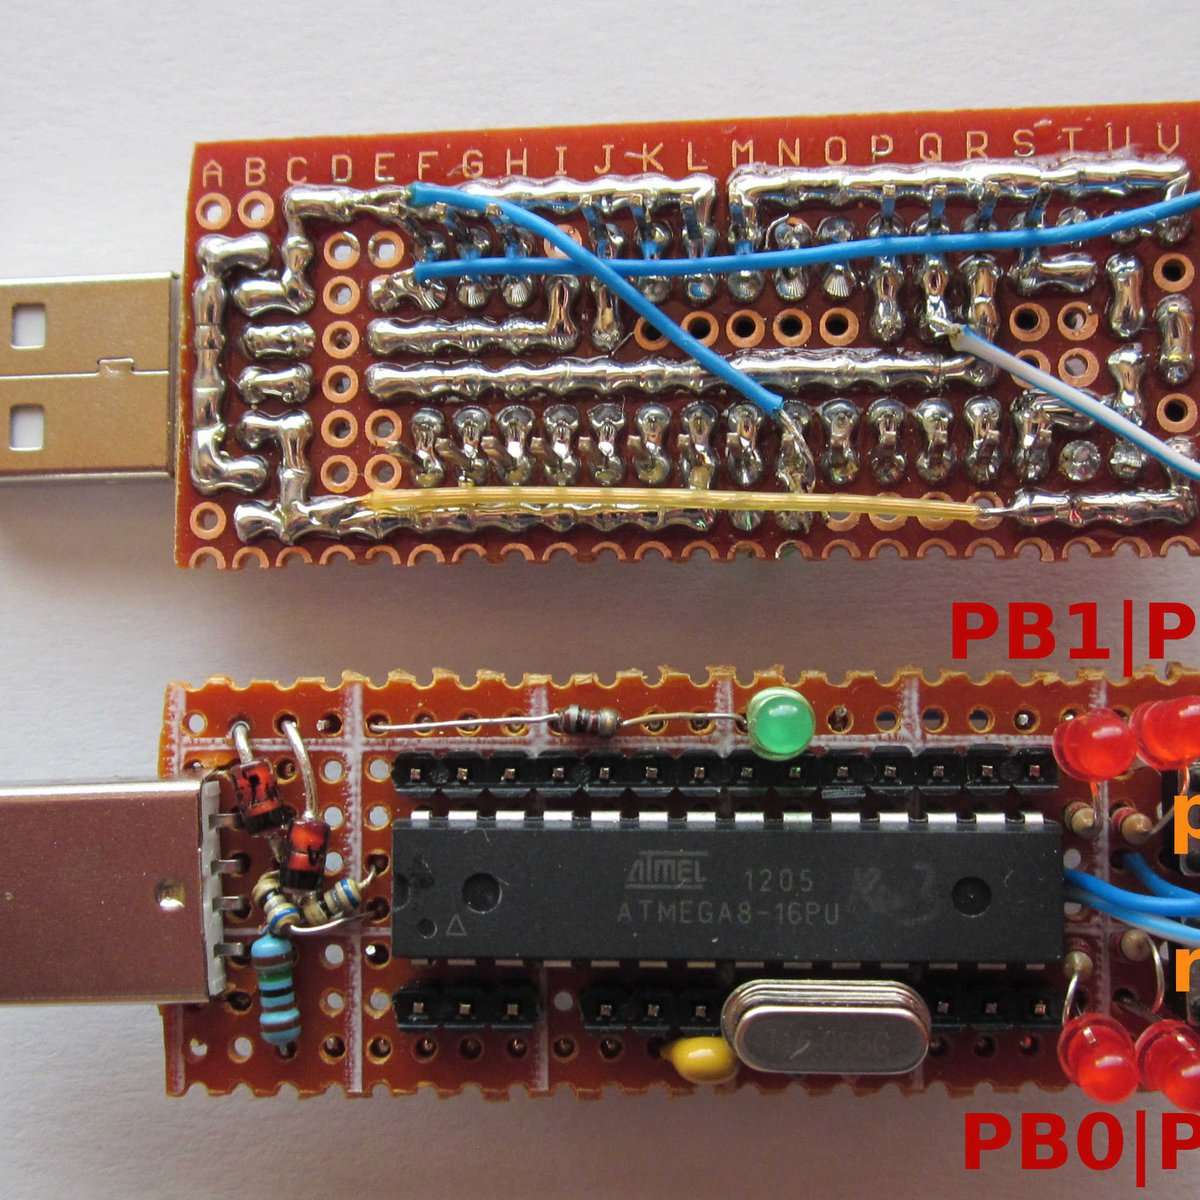 Tinyusbboard Rev 3 Tht Kit From Matrixstorm On Tindie Usbasp Avr Programmer Flickr Photo Sharing